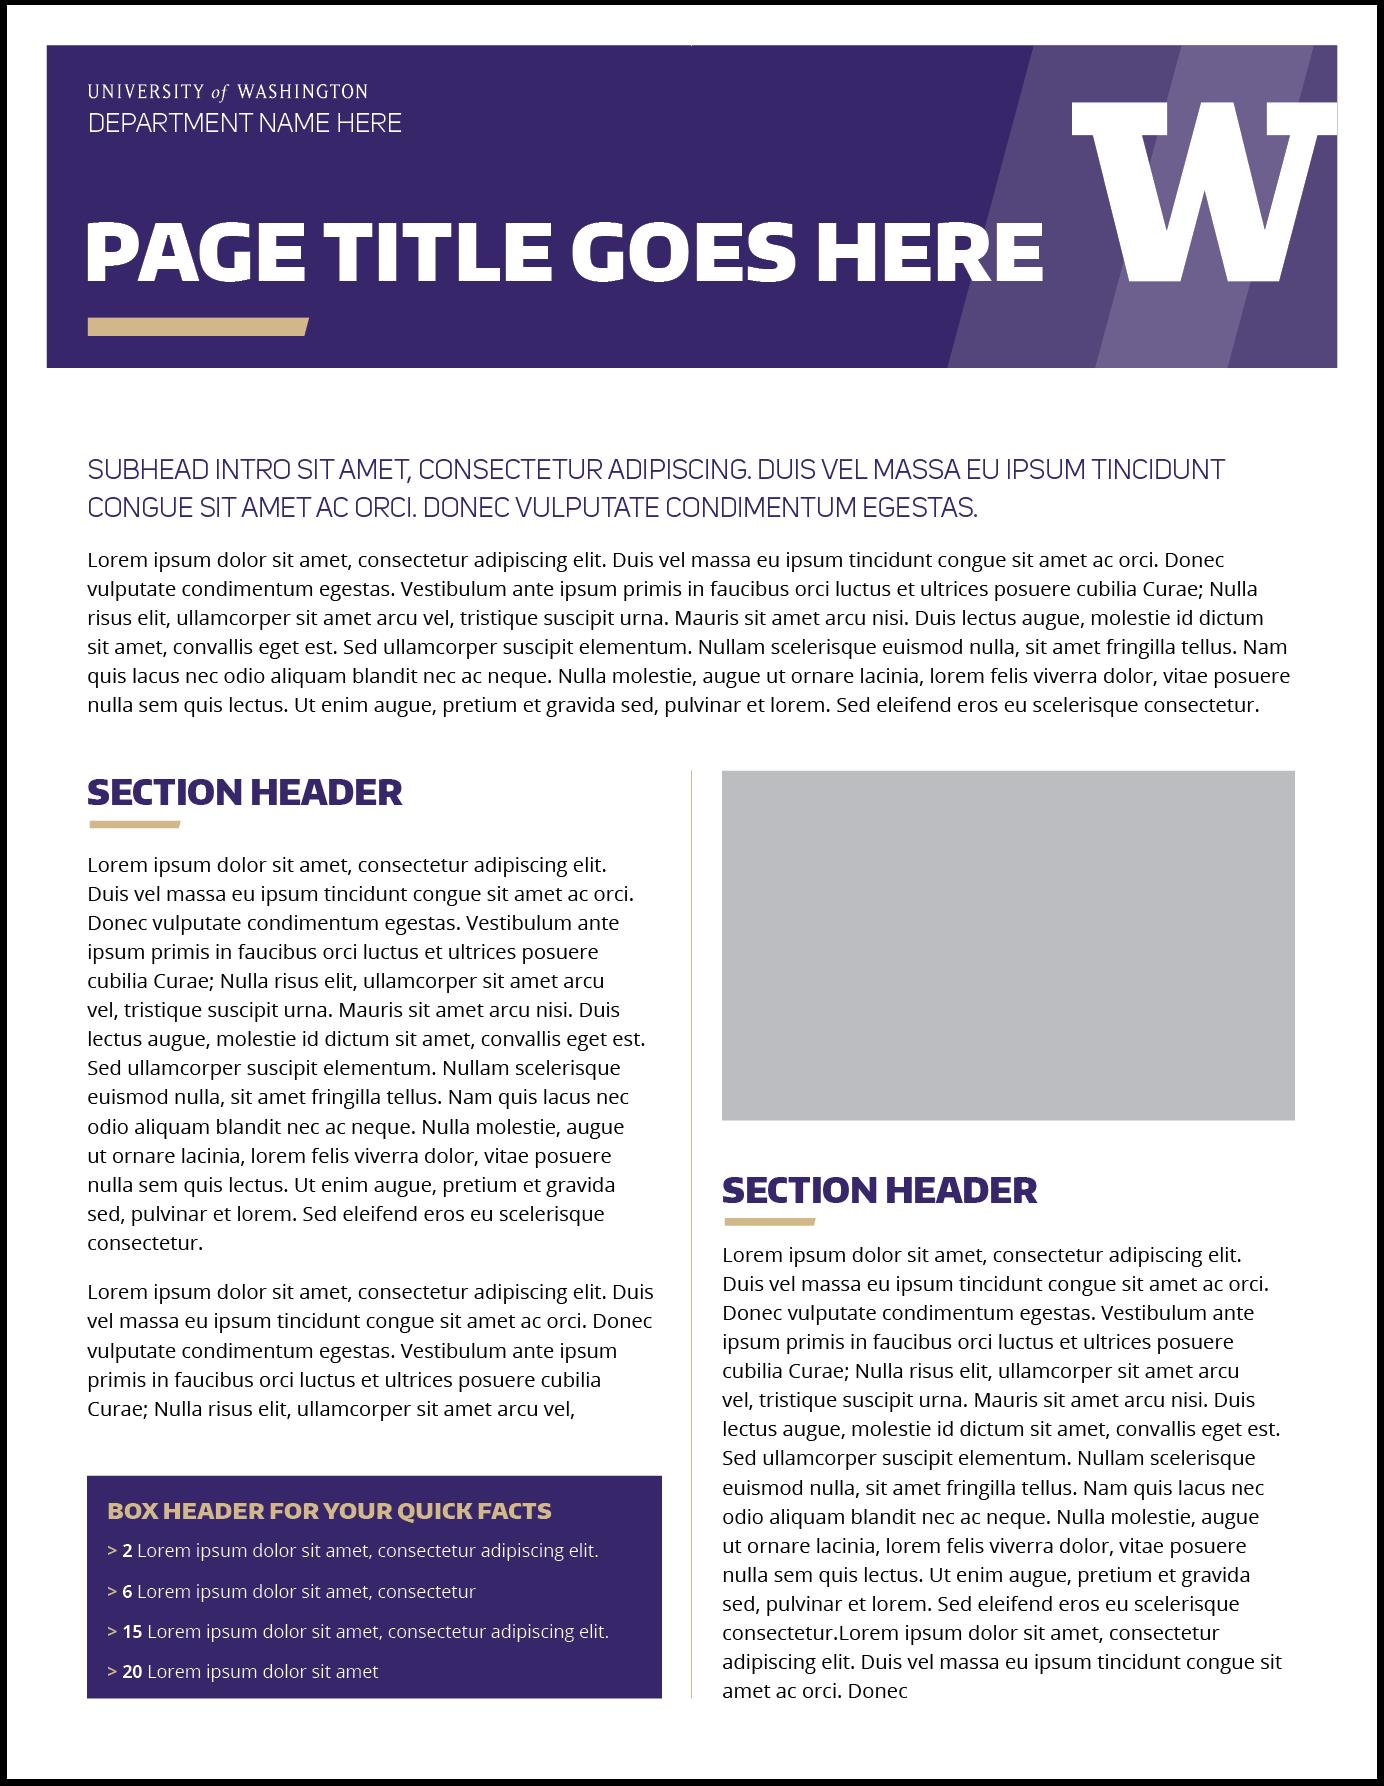 Fact Sheet  Uw Brand In Fact Card Template